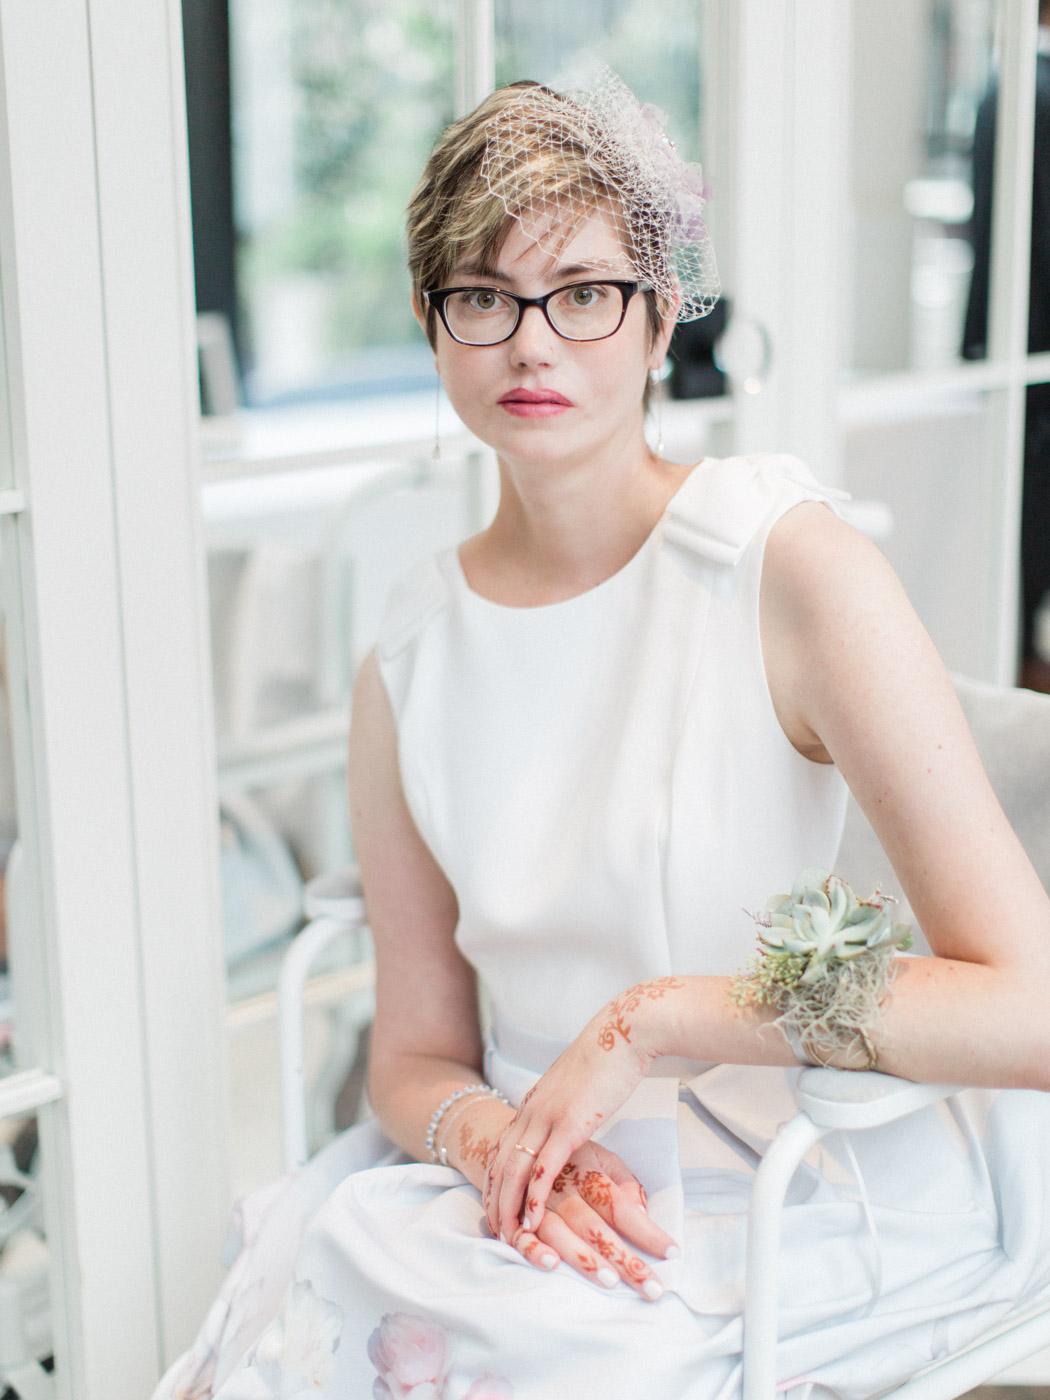 Toronto-wedding-photographer-intimate-restaurant-elopement-chase-oyster-downtown13.jpg